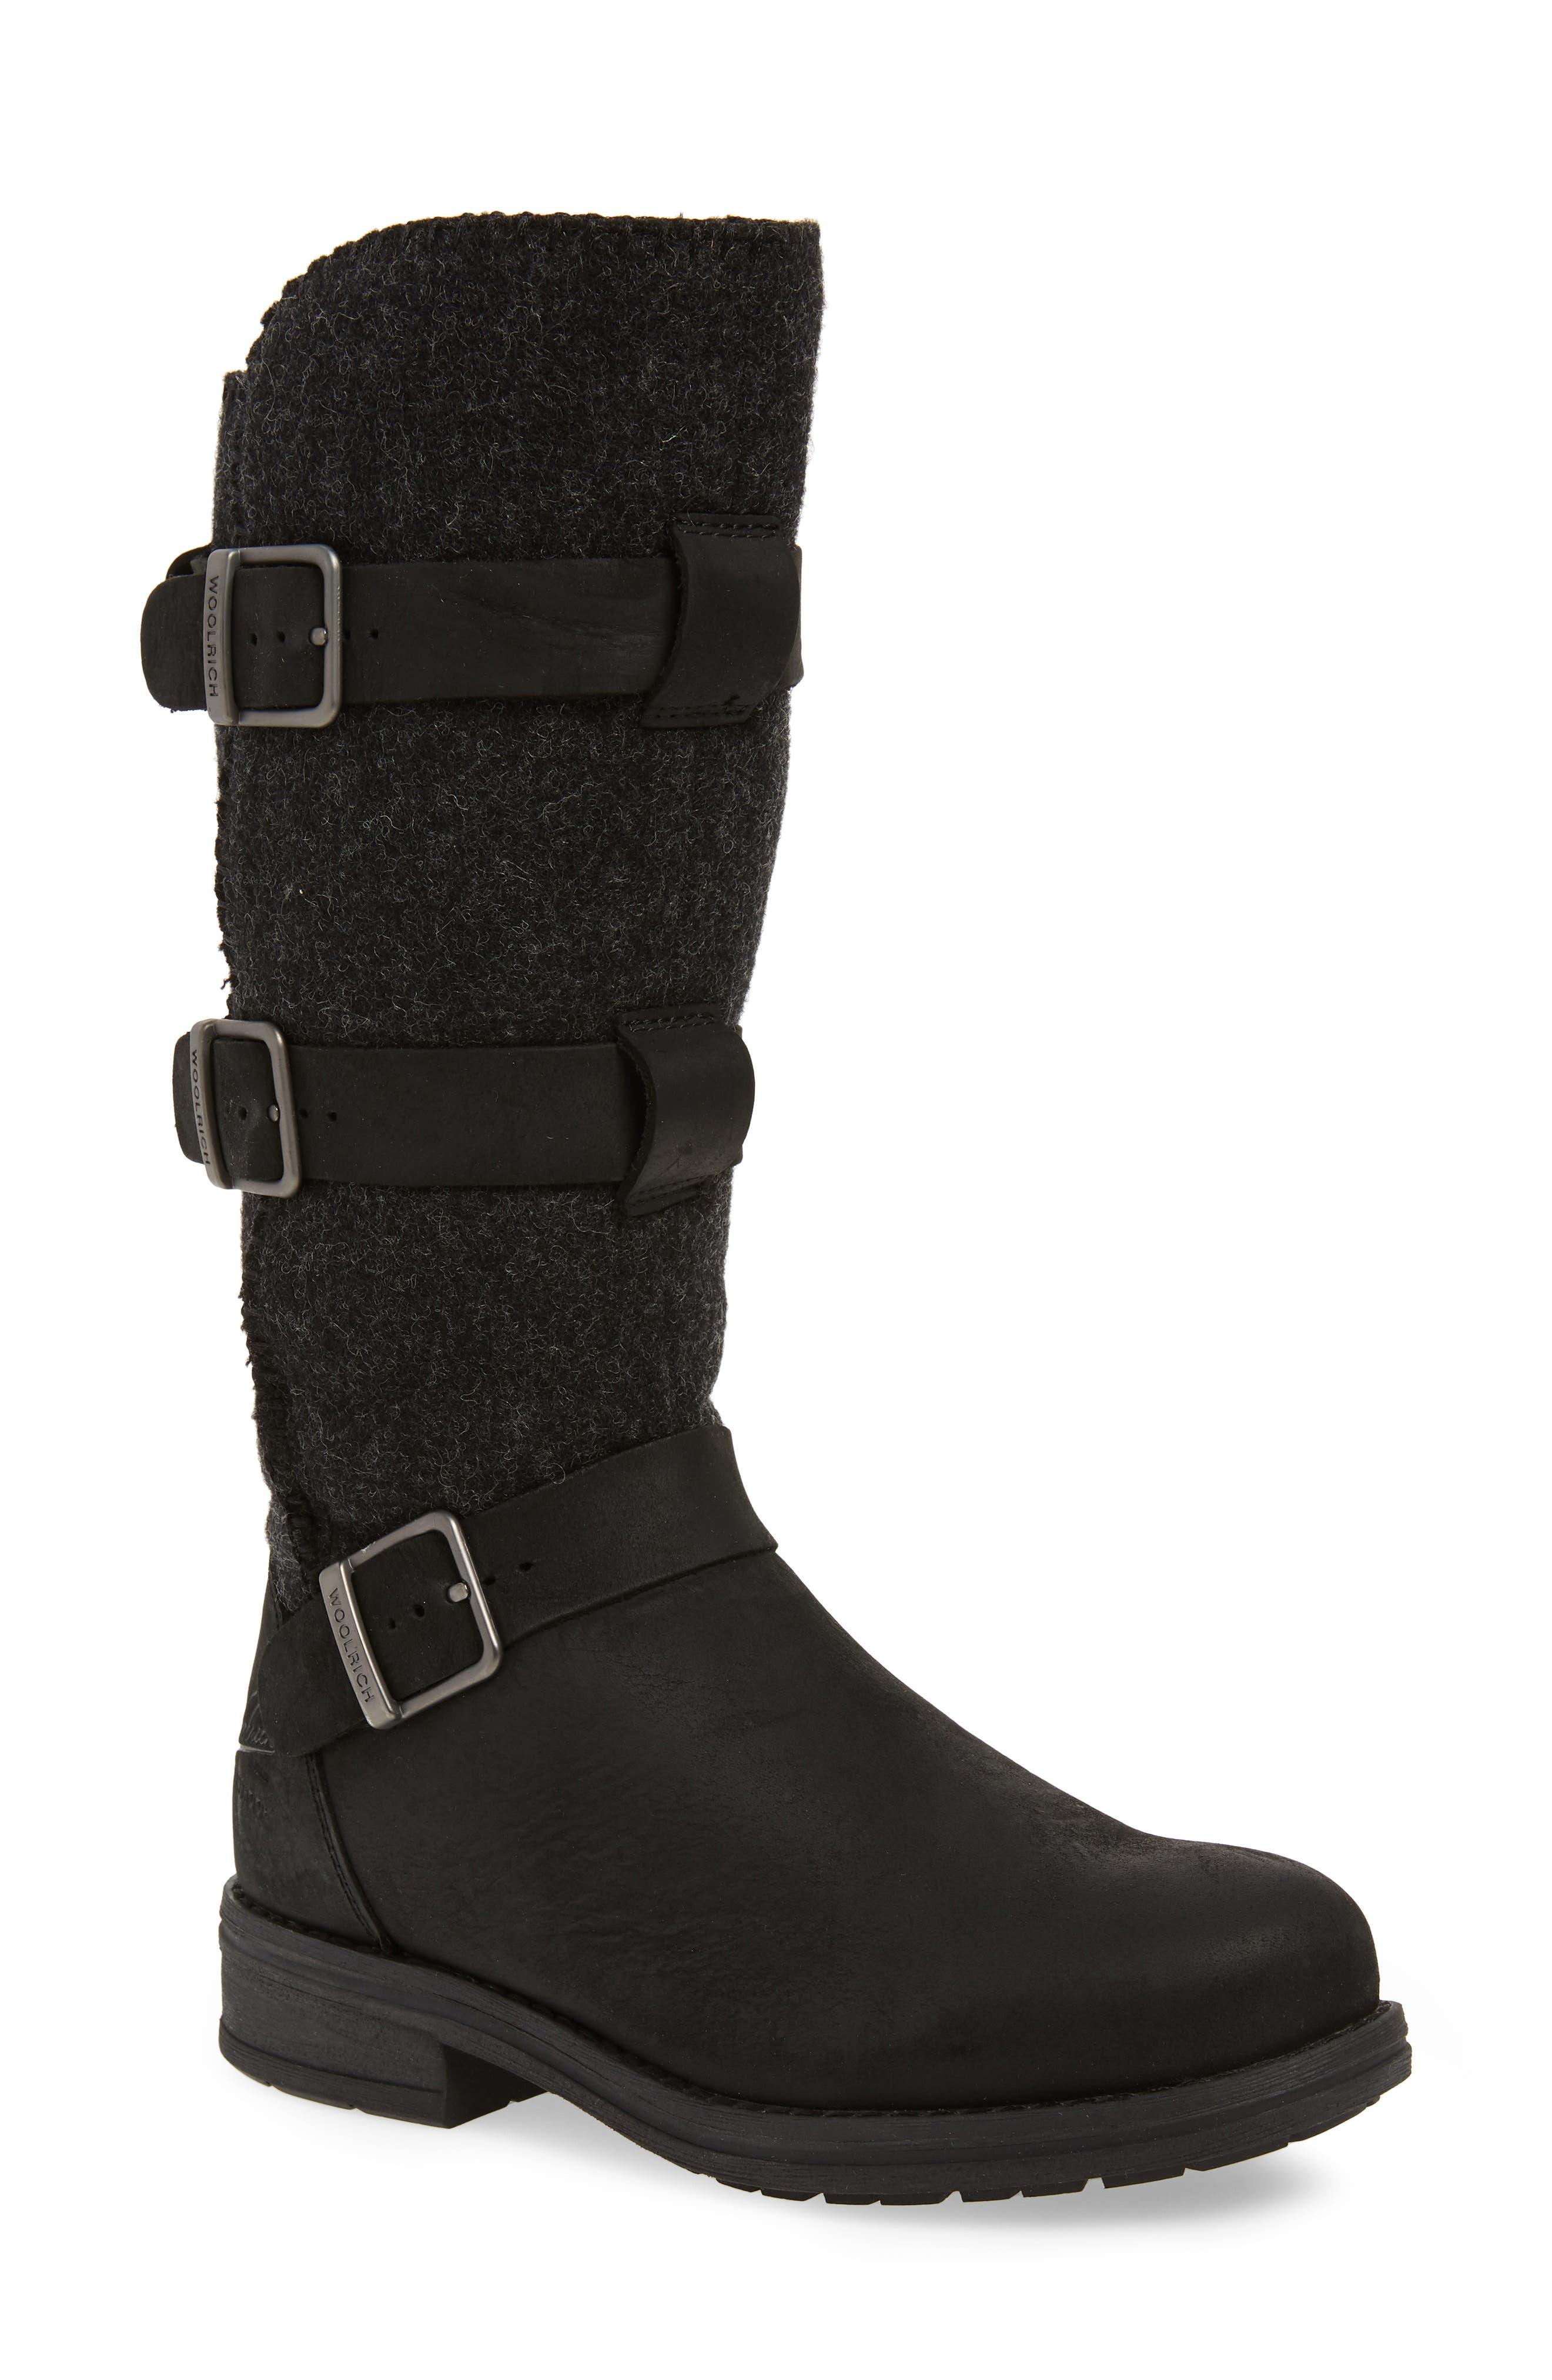 Woolrich Frontier Waterproof Boot, Black